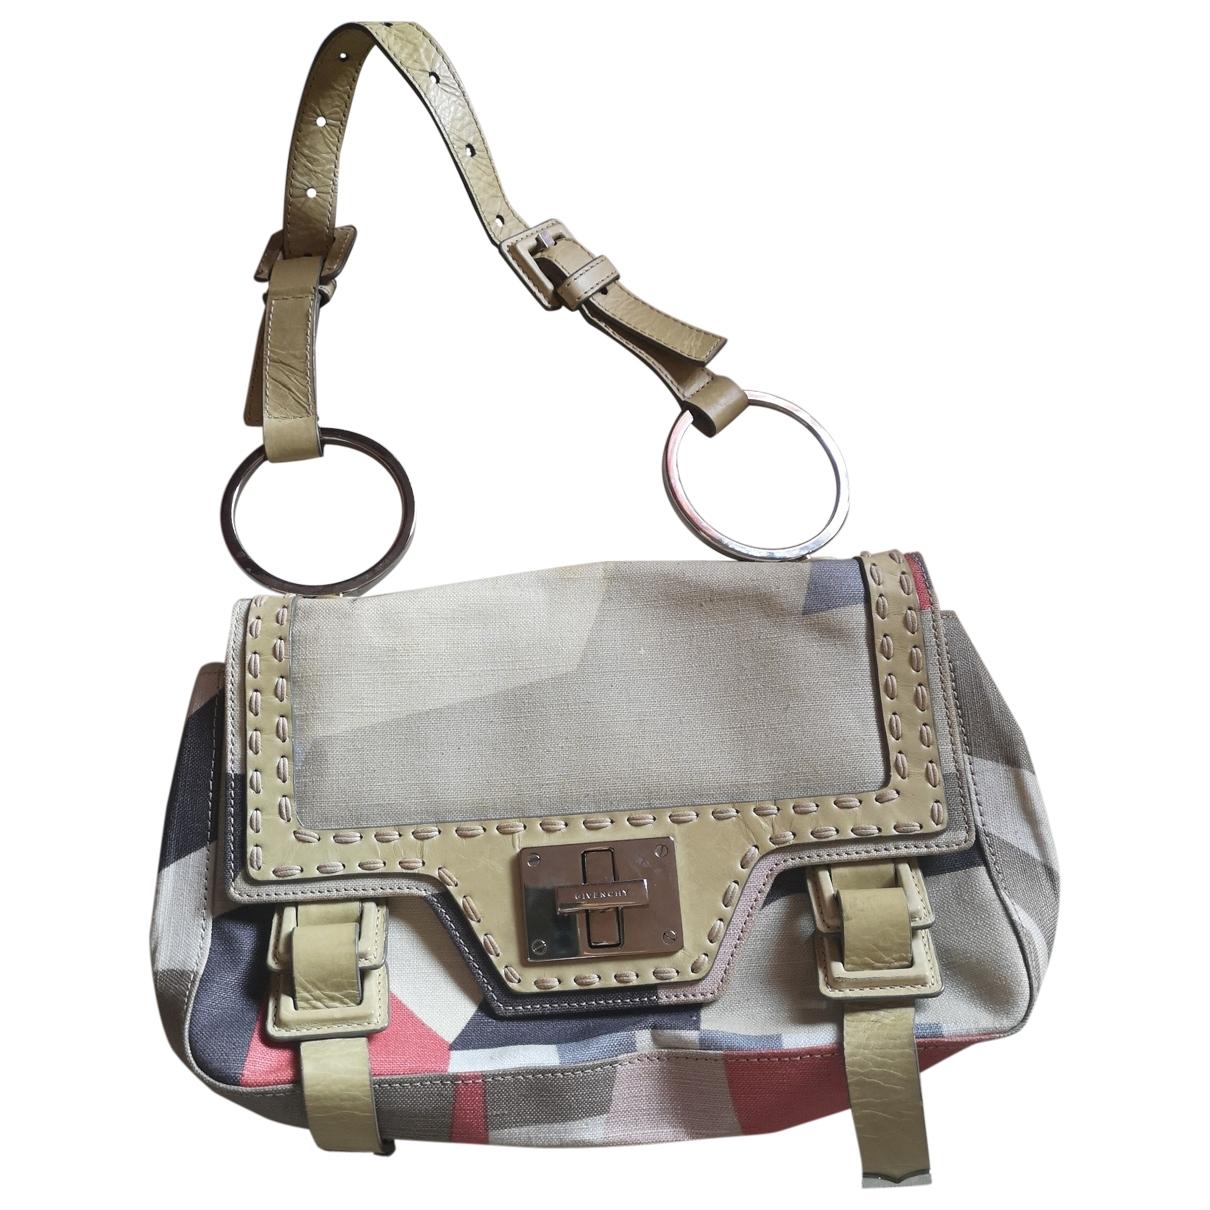 Givenchy \N Multicolour Leather handbag for Women \N